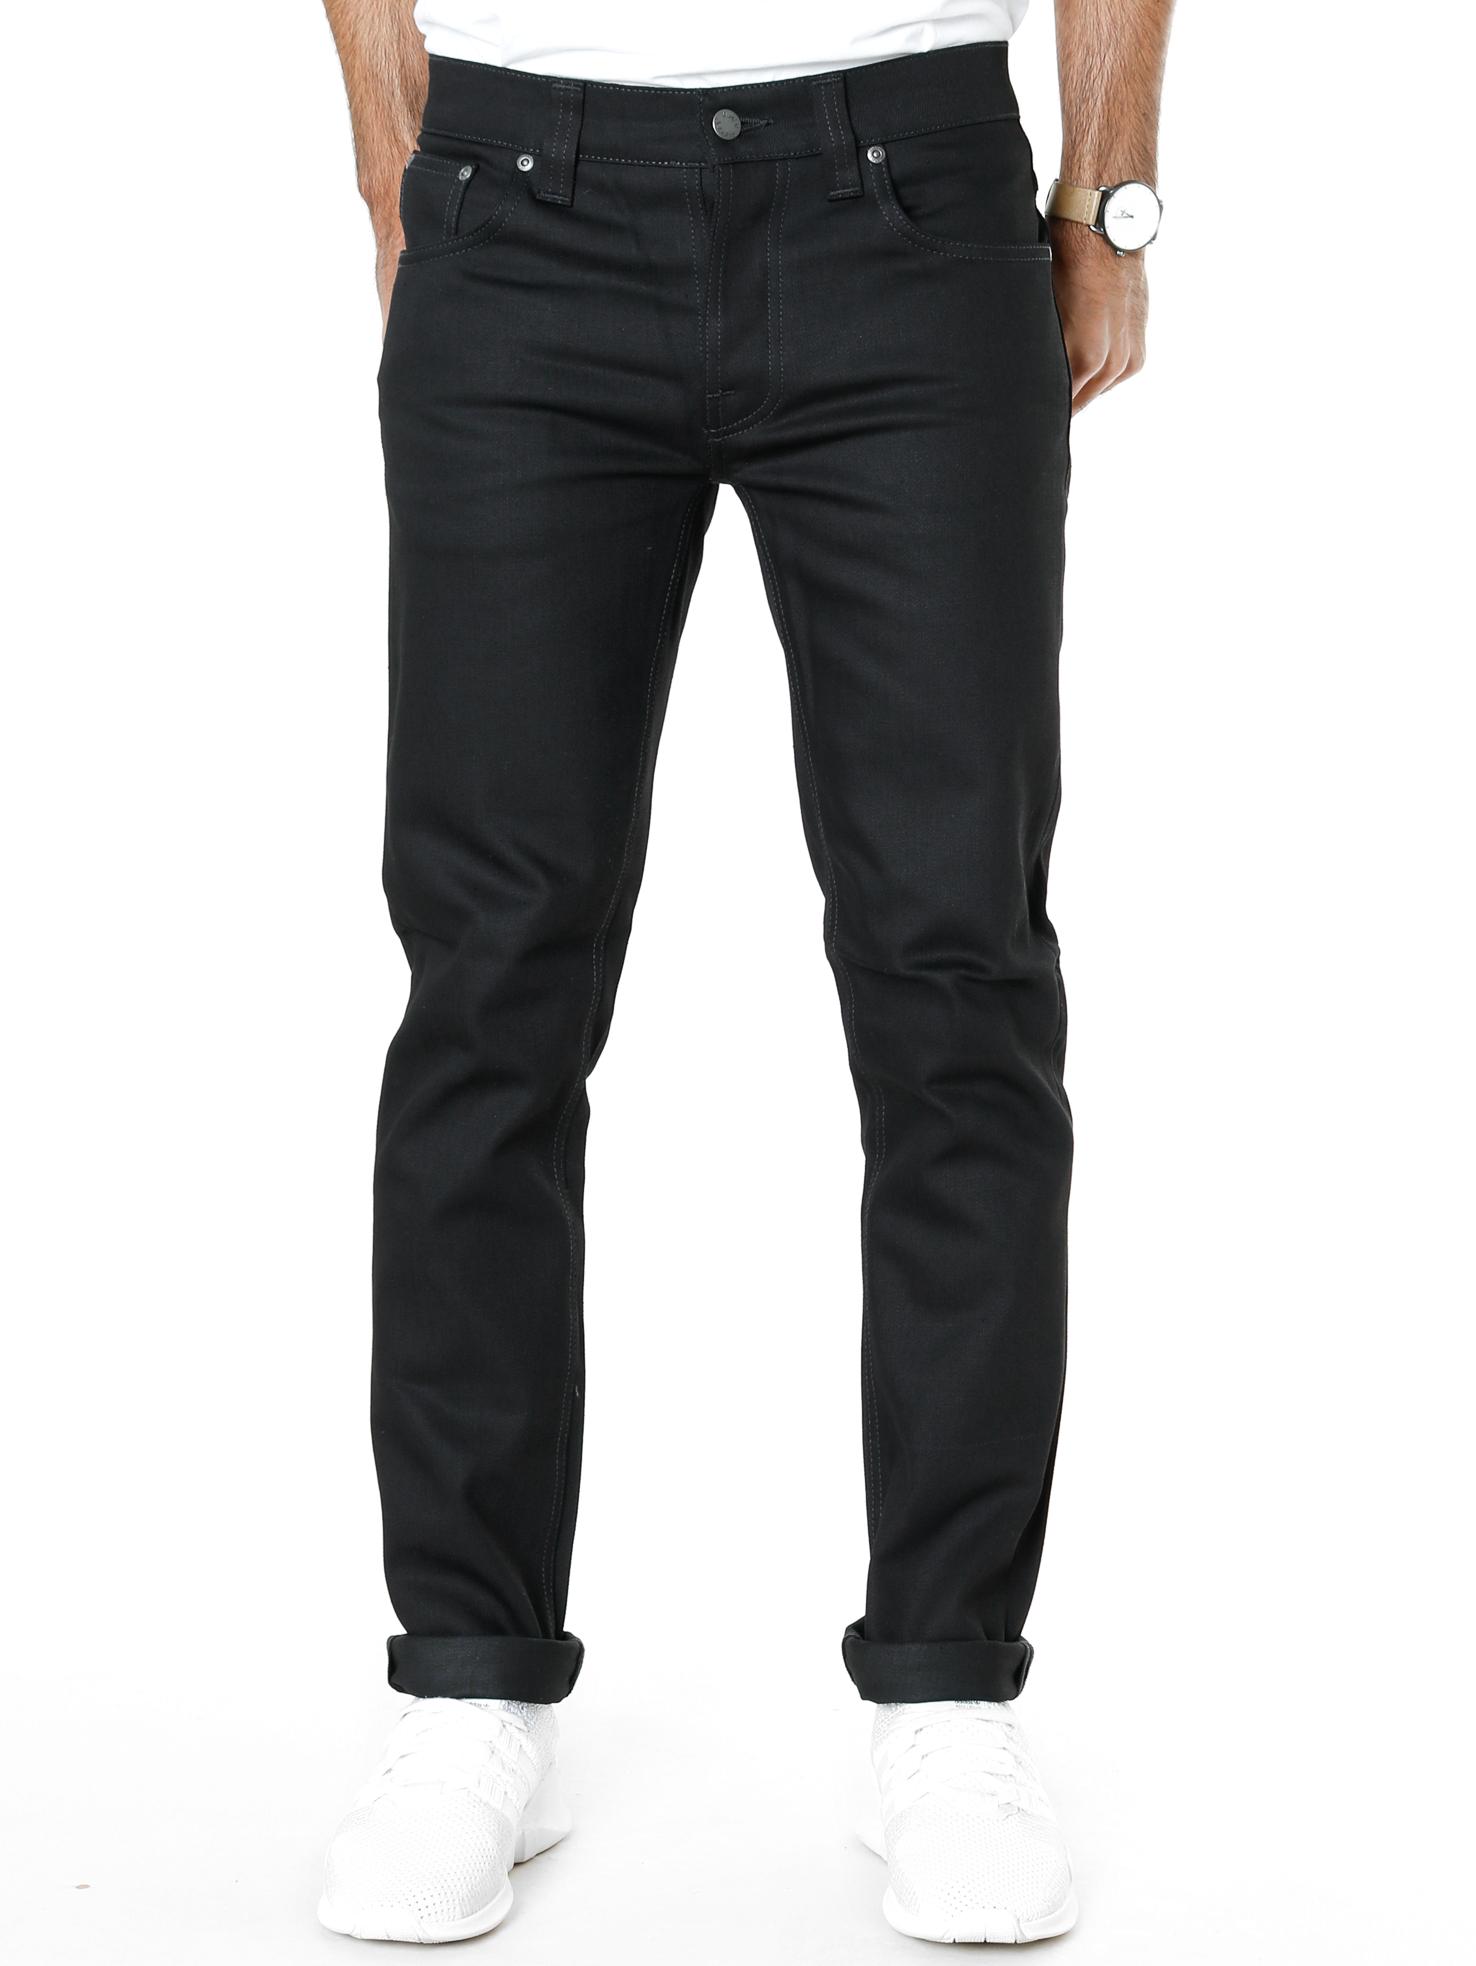 Nudie Mens Slim Fit Stretch Jeans 12.7oz Grim Tim Black Sparkles